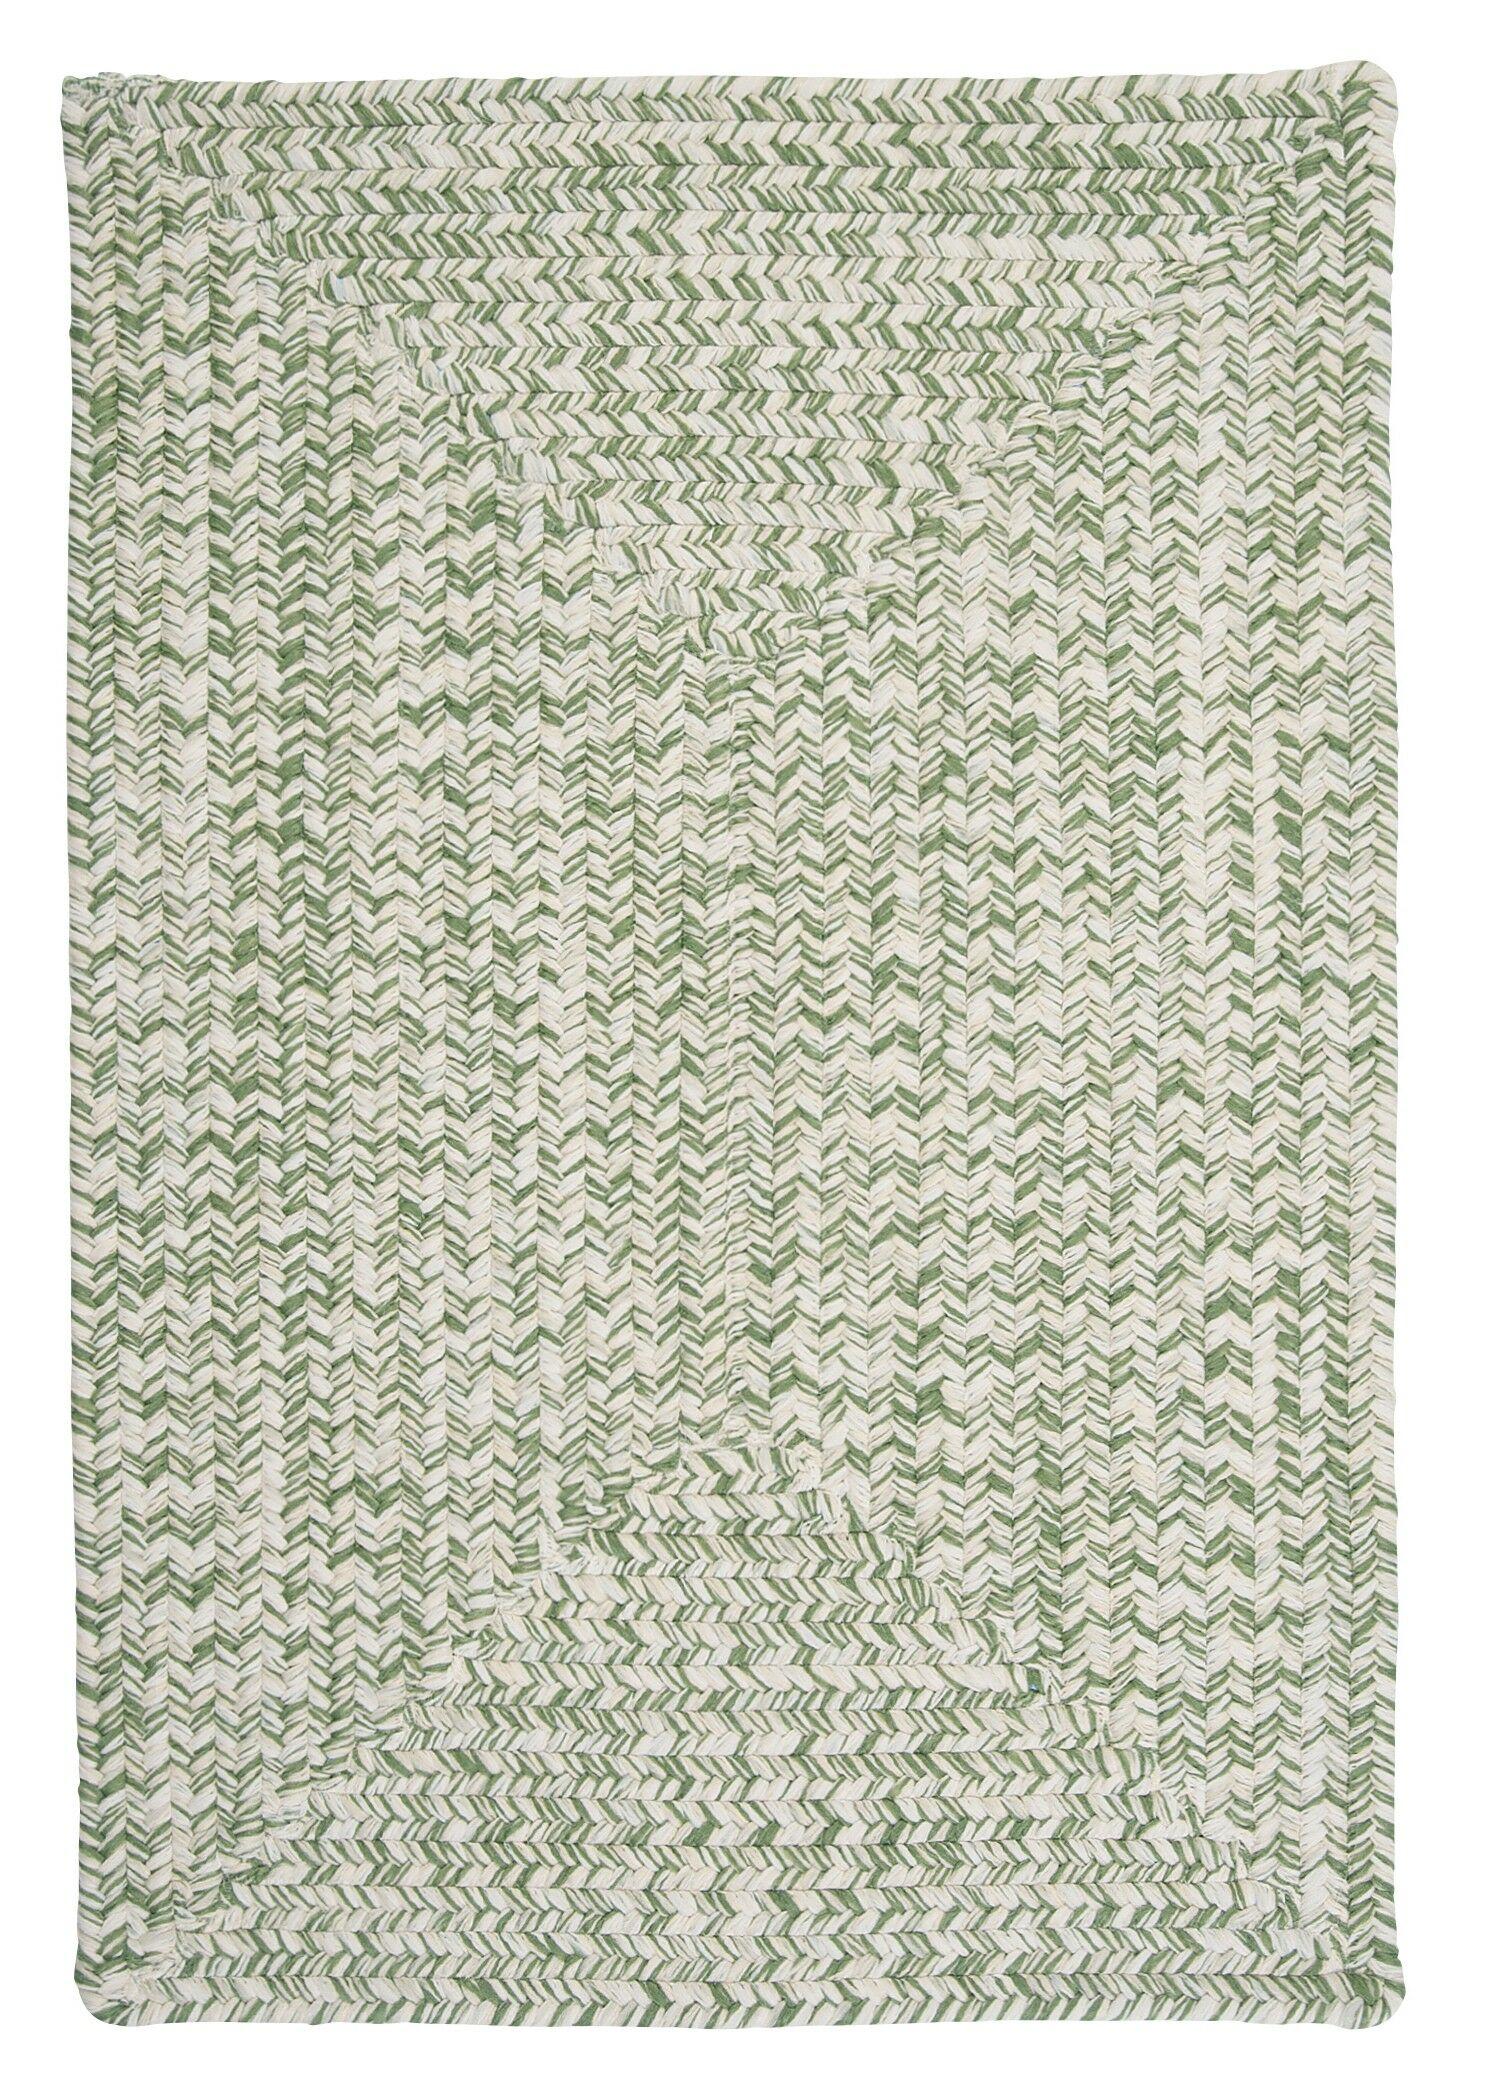 Hawkins Greenery Indoor / Outdoor Area Rug Rug Size: Rectangle 10' x 13'